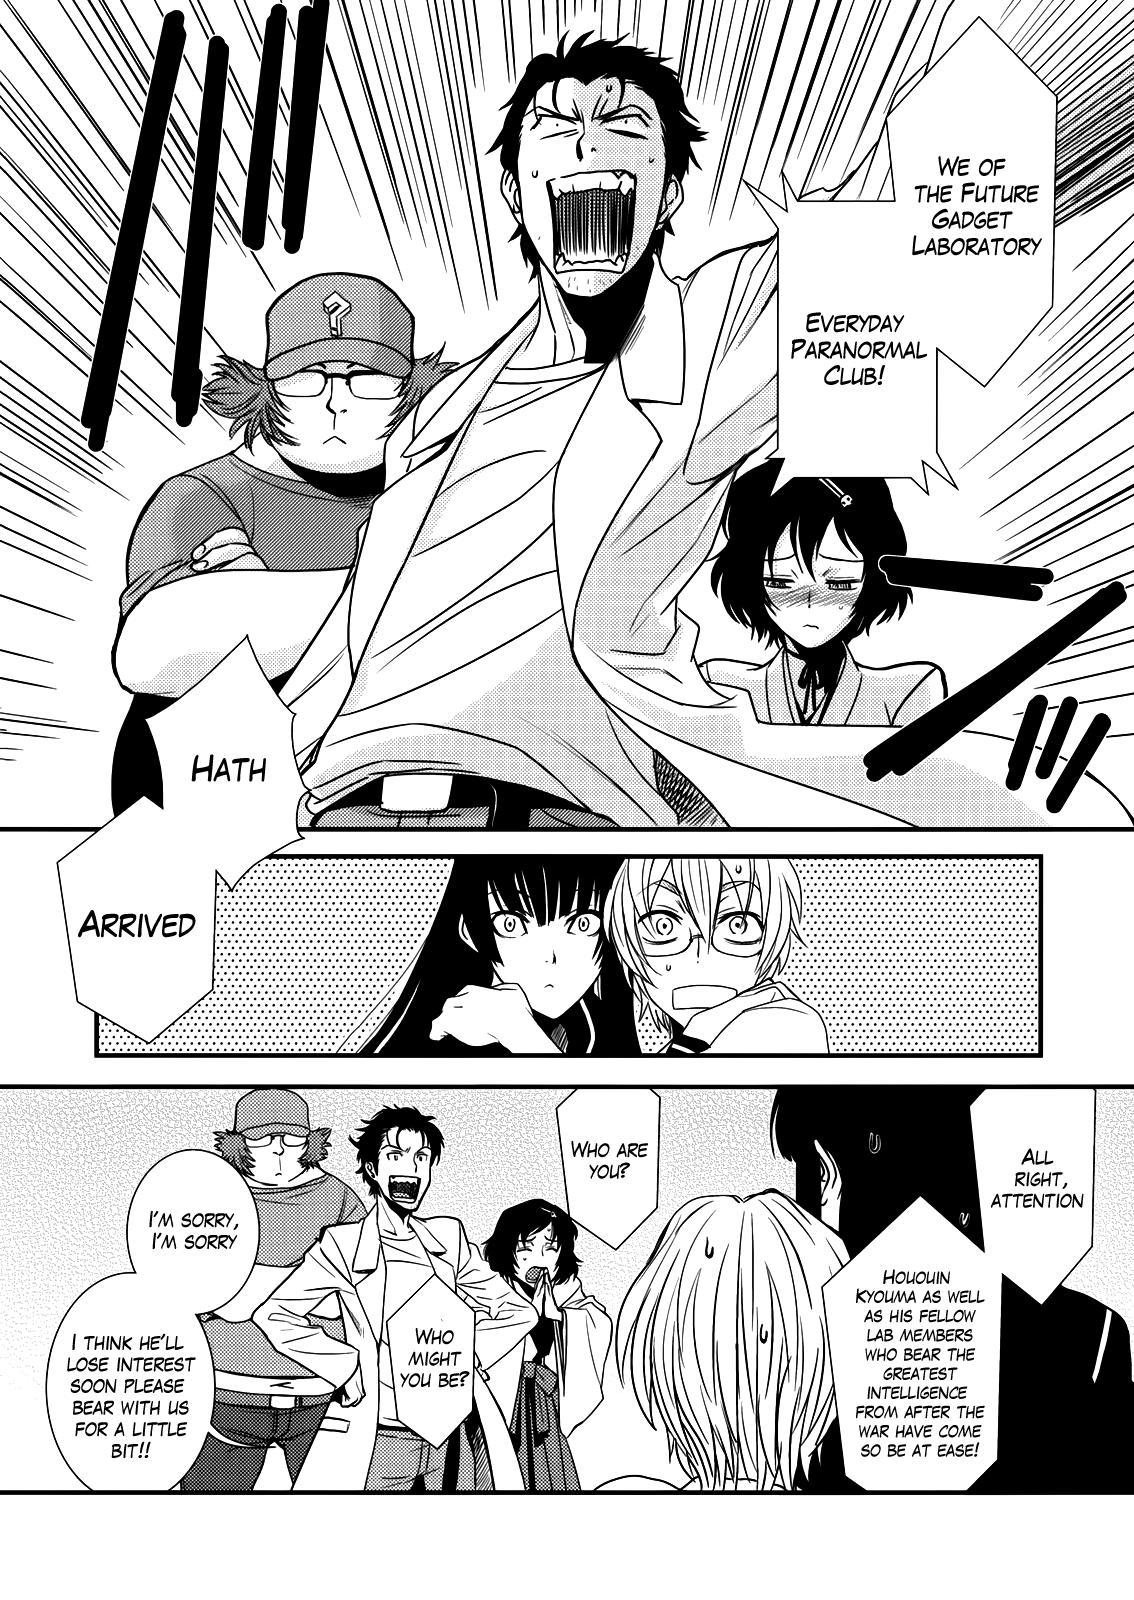 Hontou ni Atta Kowai Hanashi   It Really Was There! A Scary Story 4